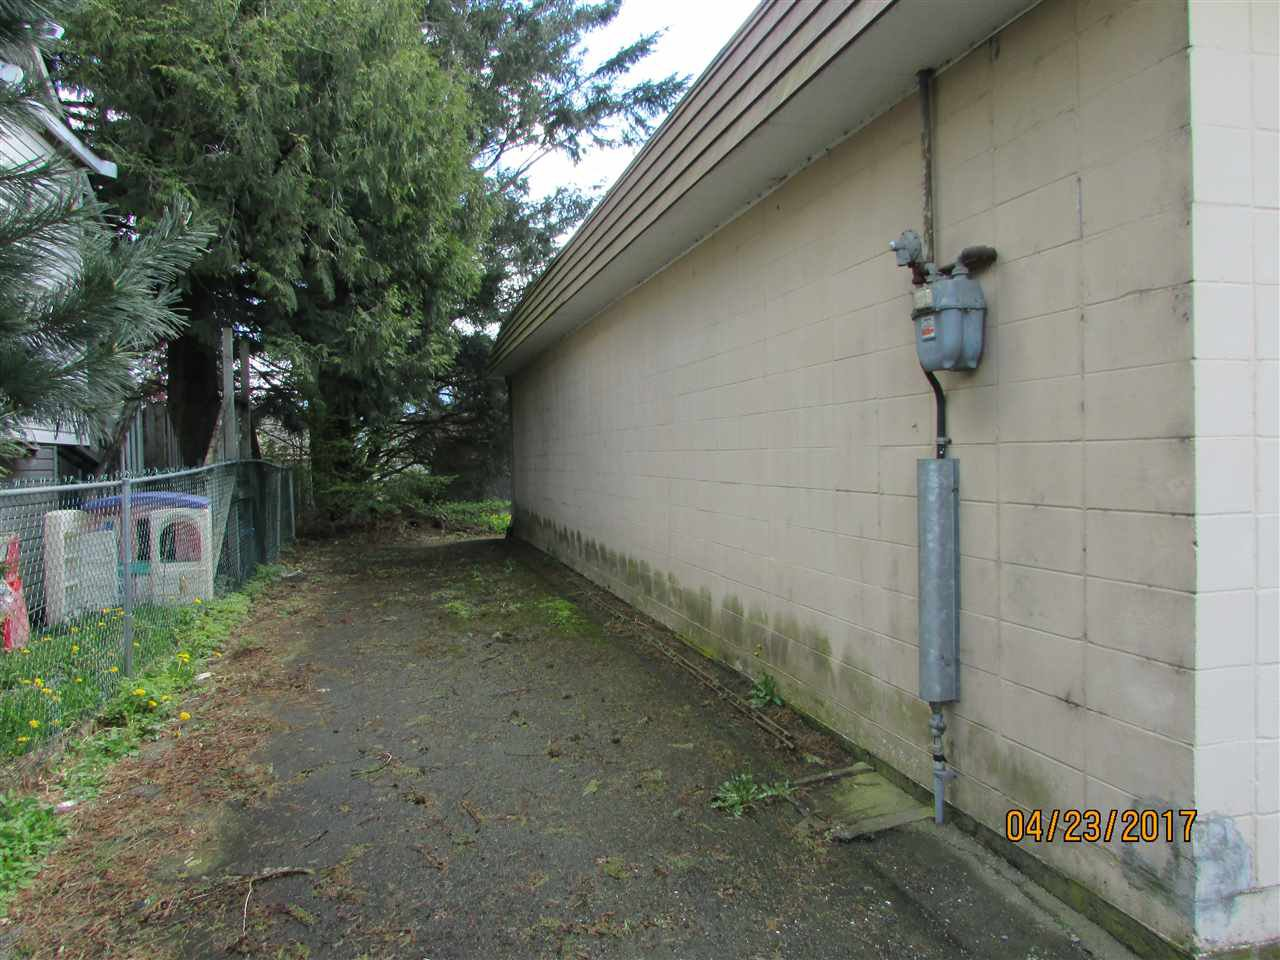 Photo 4: Photos: 7220 EVANS Road in Sardis: Sardis West Vedder Rd House for sale : MLS®# R2160379